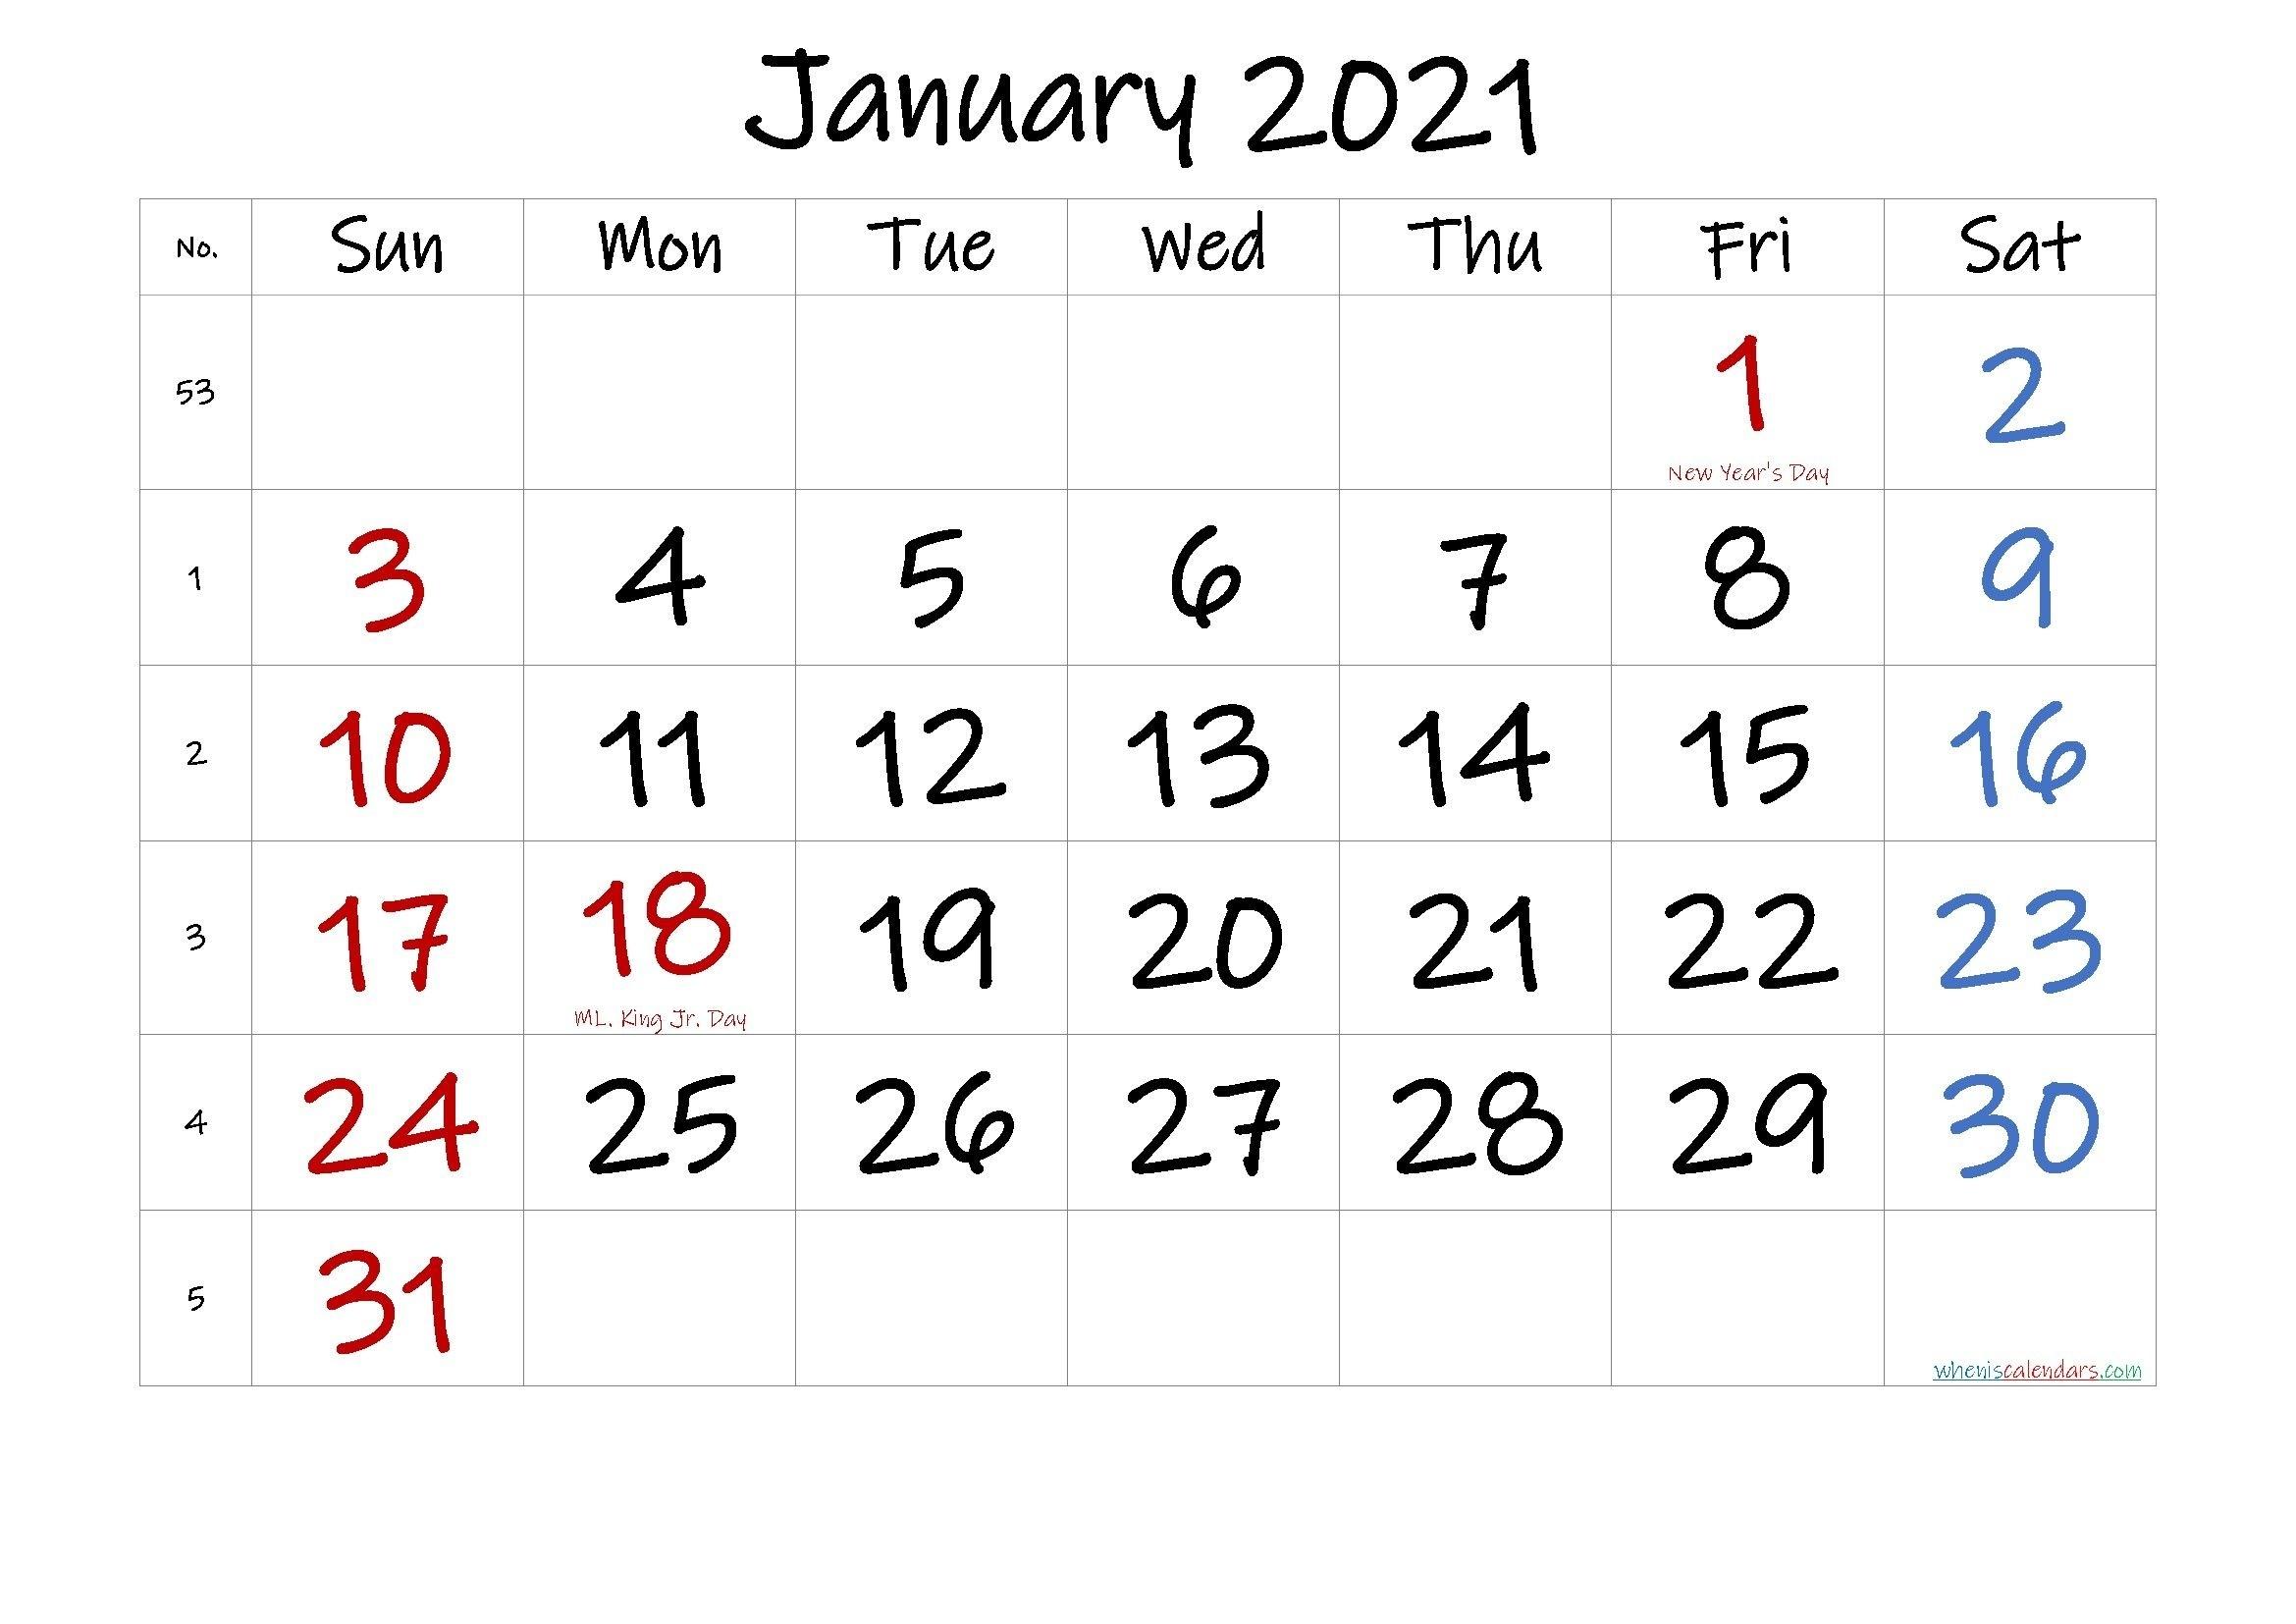 Printable December 2020 January 2021 Calendar | Free Printable Calendar Calendar December 2020 January 2021